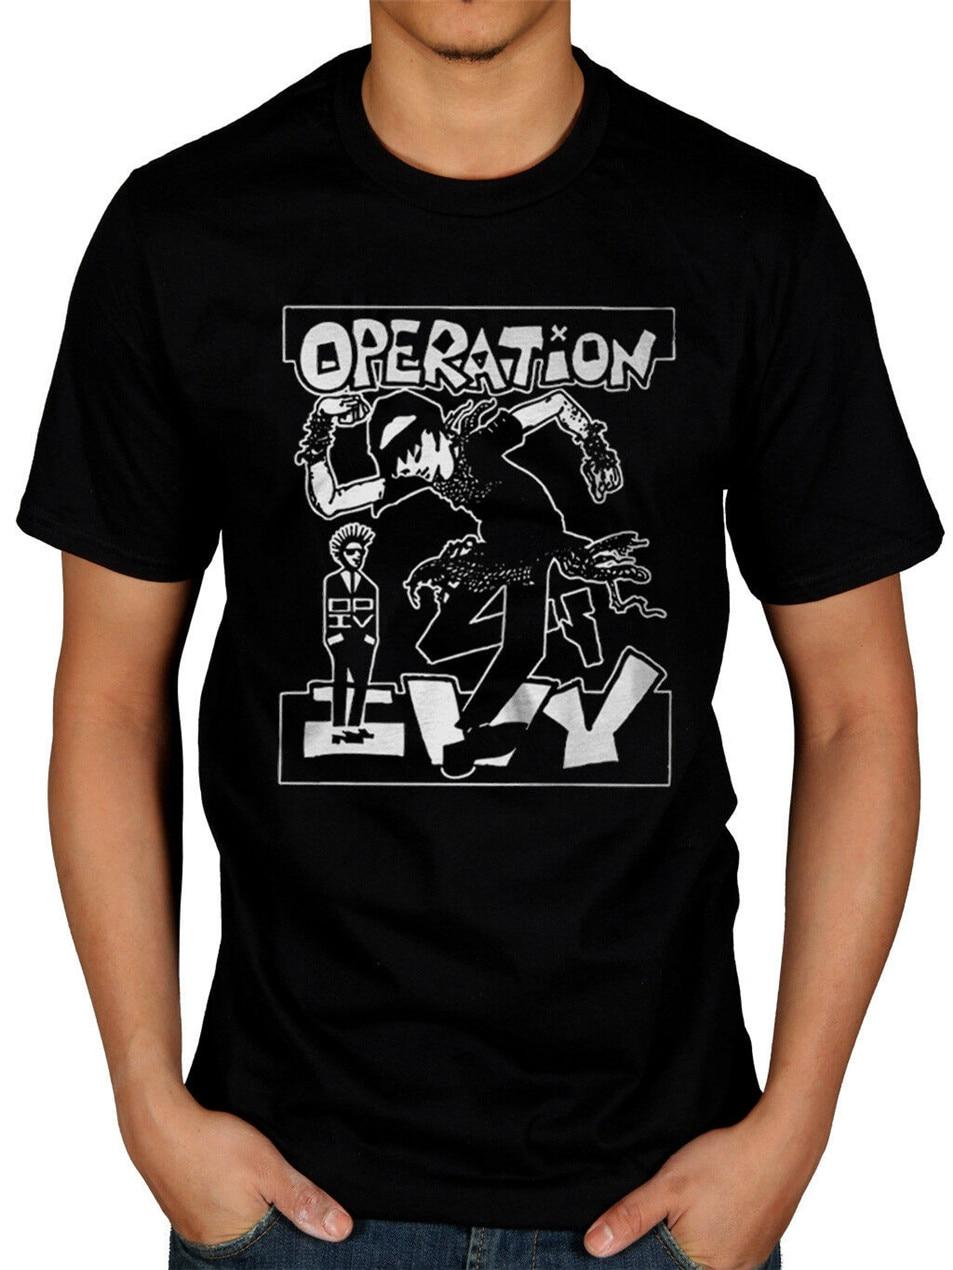 Operation Ivy Skankin T-Shirt Lint Rides Again Seedy Hectic King 2Xl 3Xl 4Xl 26Xl Tee Shirt